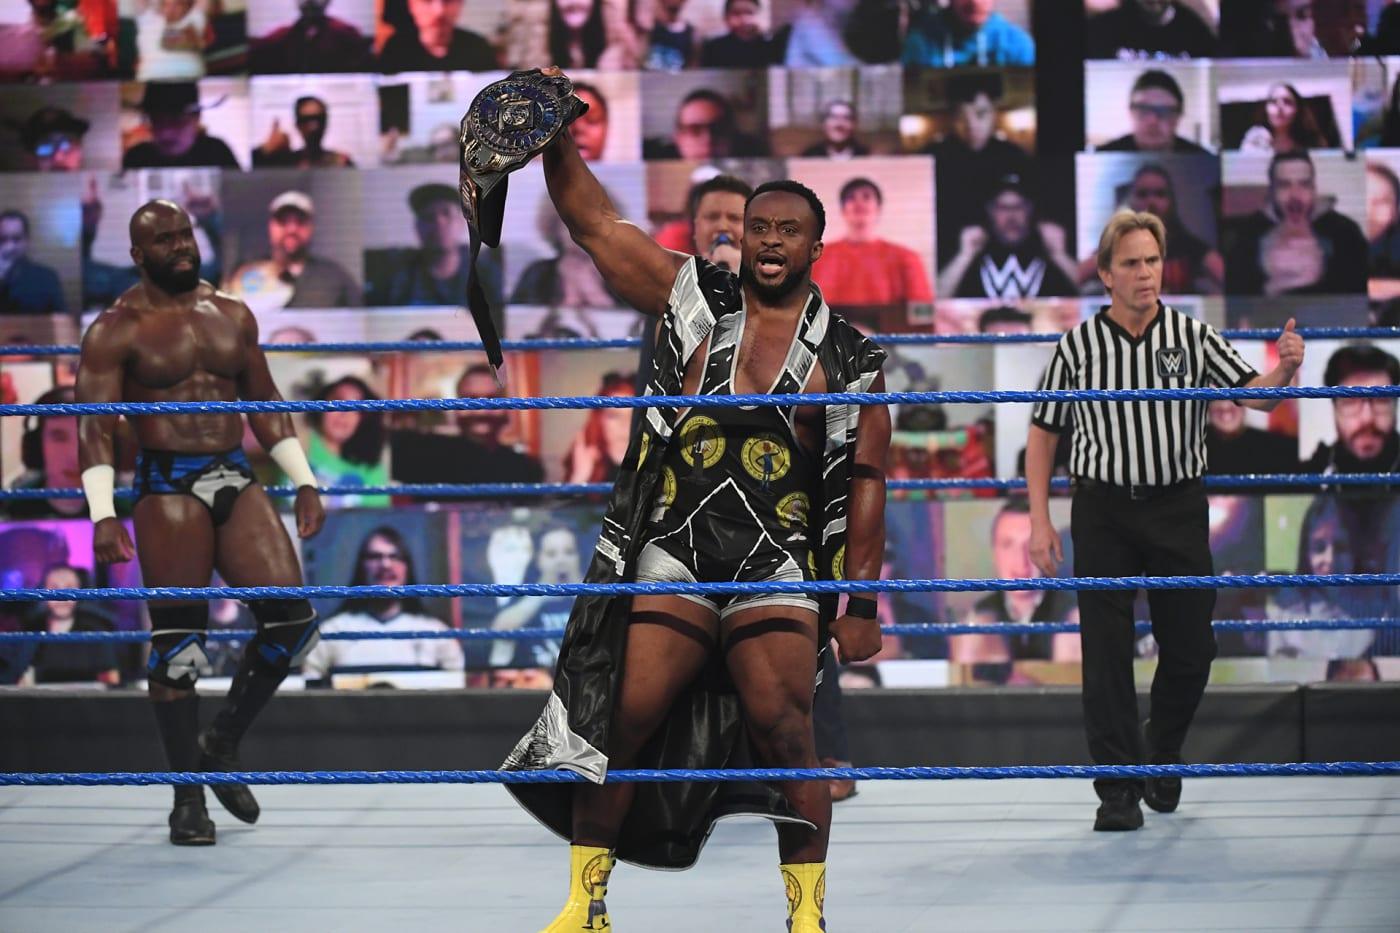 WWE Intercontinental Champion Big E on Smackdown